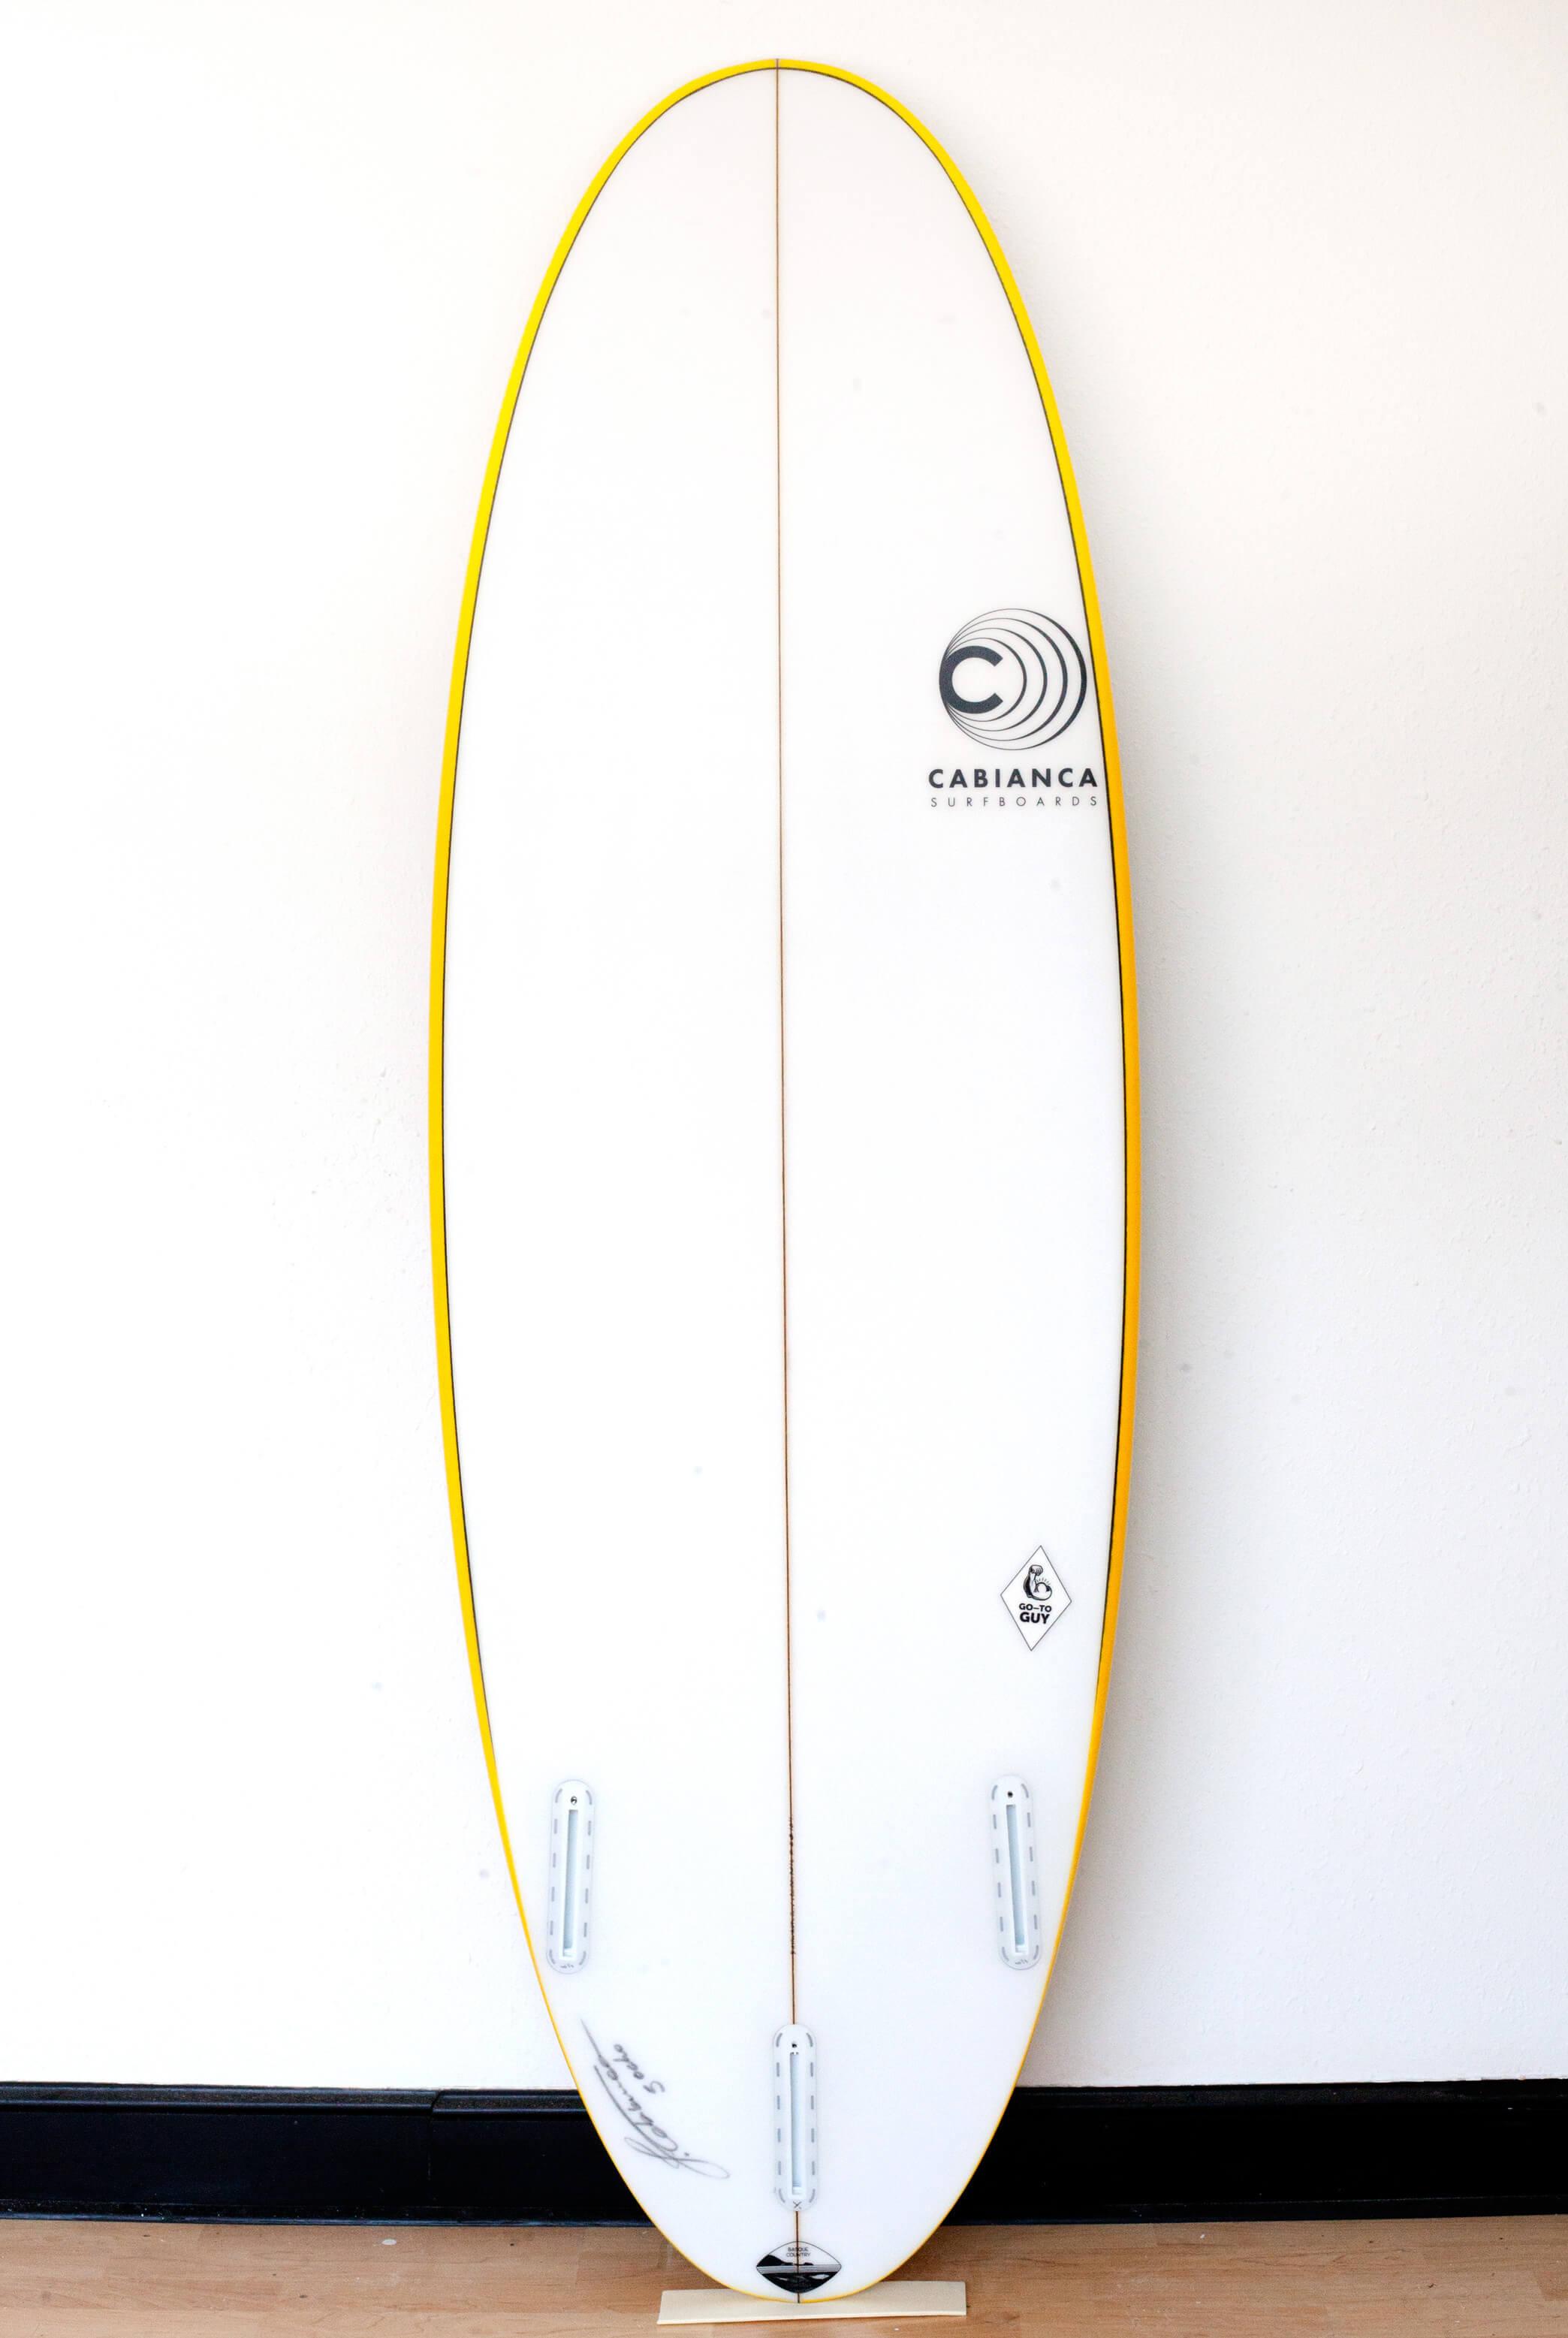 cabianca surfboards gabriel medina gotoguy shortboard